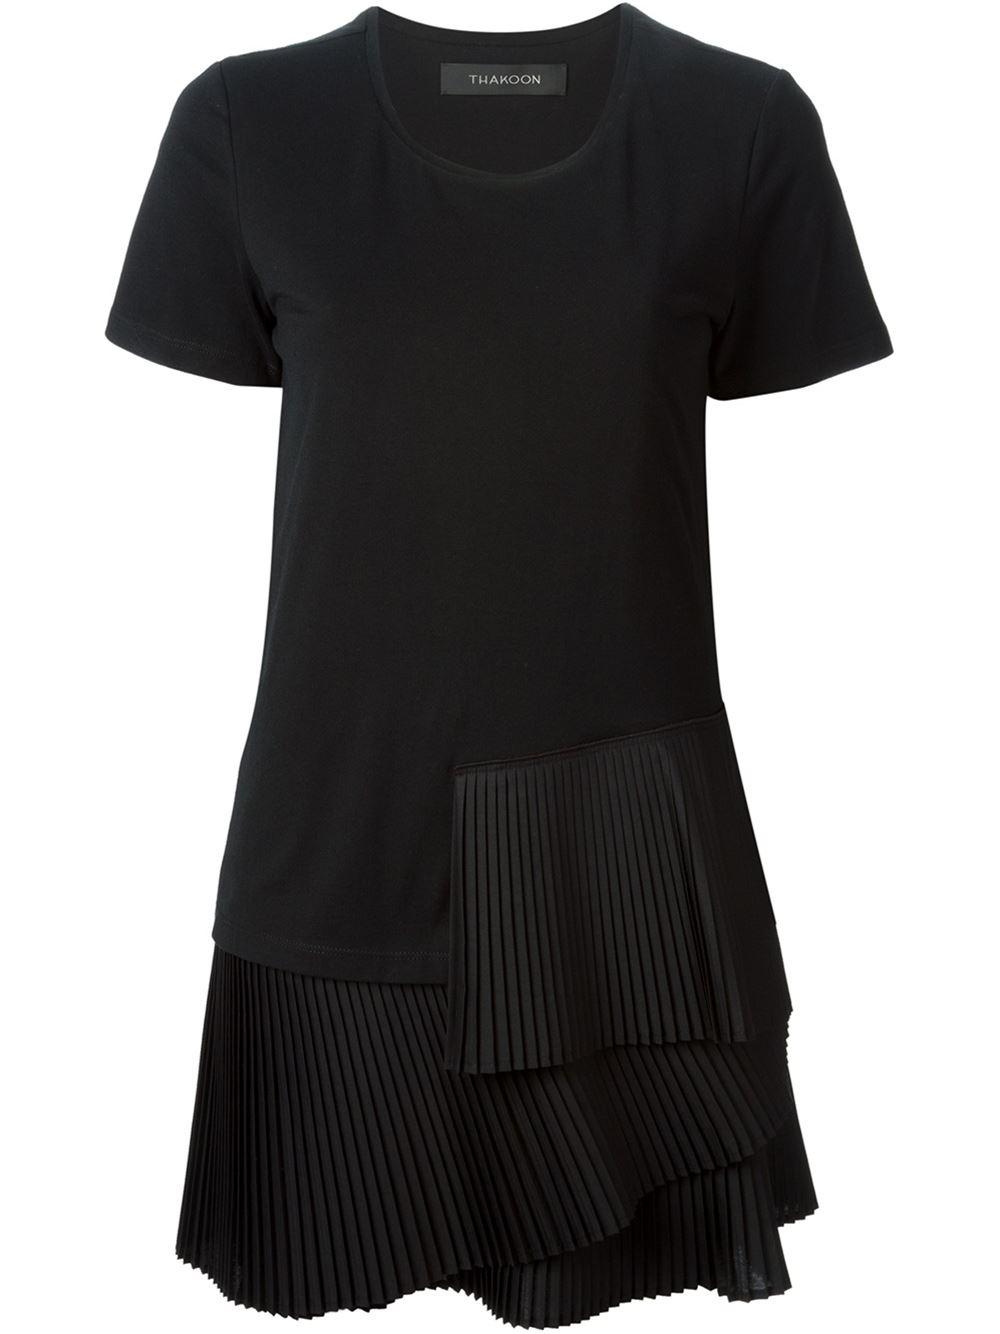 Thakoon layered pleated hem t shirt dress in black lyst for Black pleated dress shirt